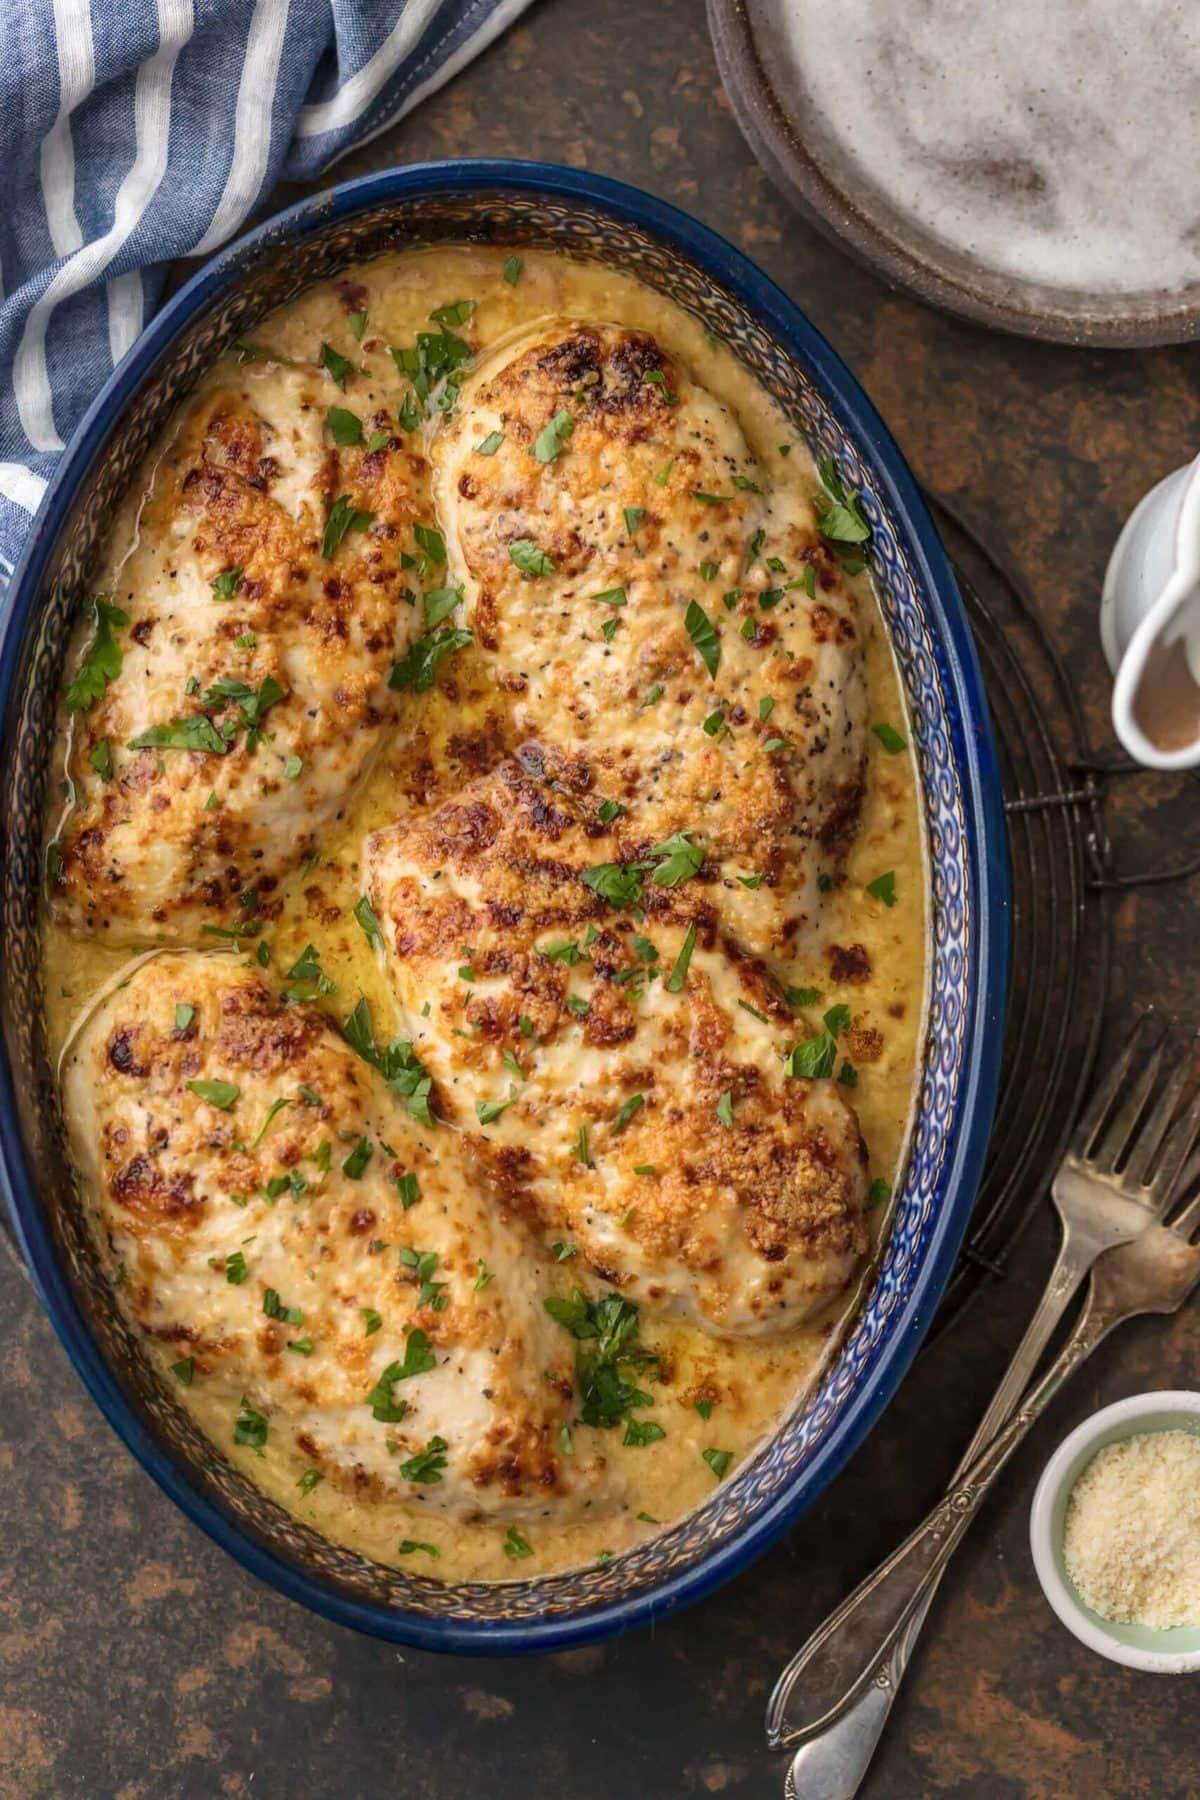 Easy Chicken Recipes To Make For Dinner 30 Chicken Dinner Ideas